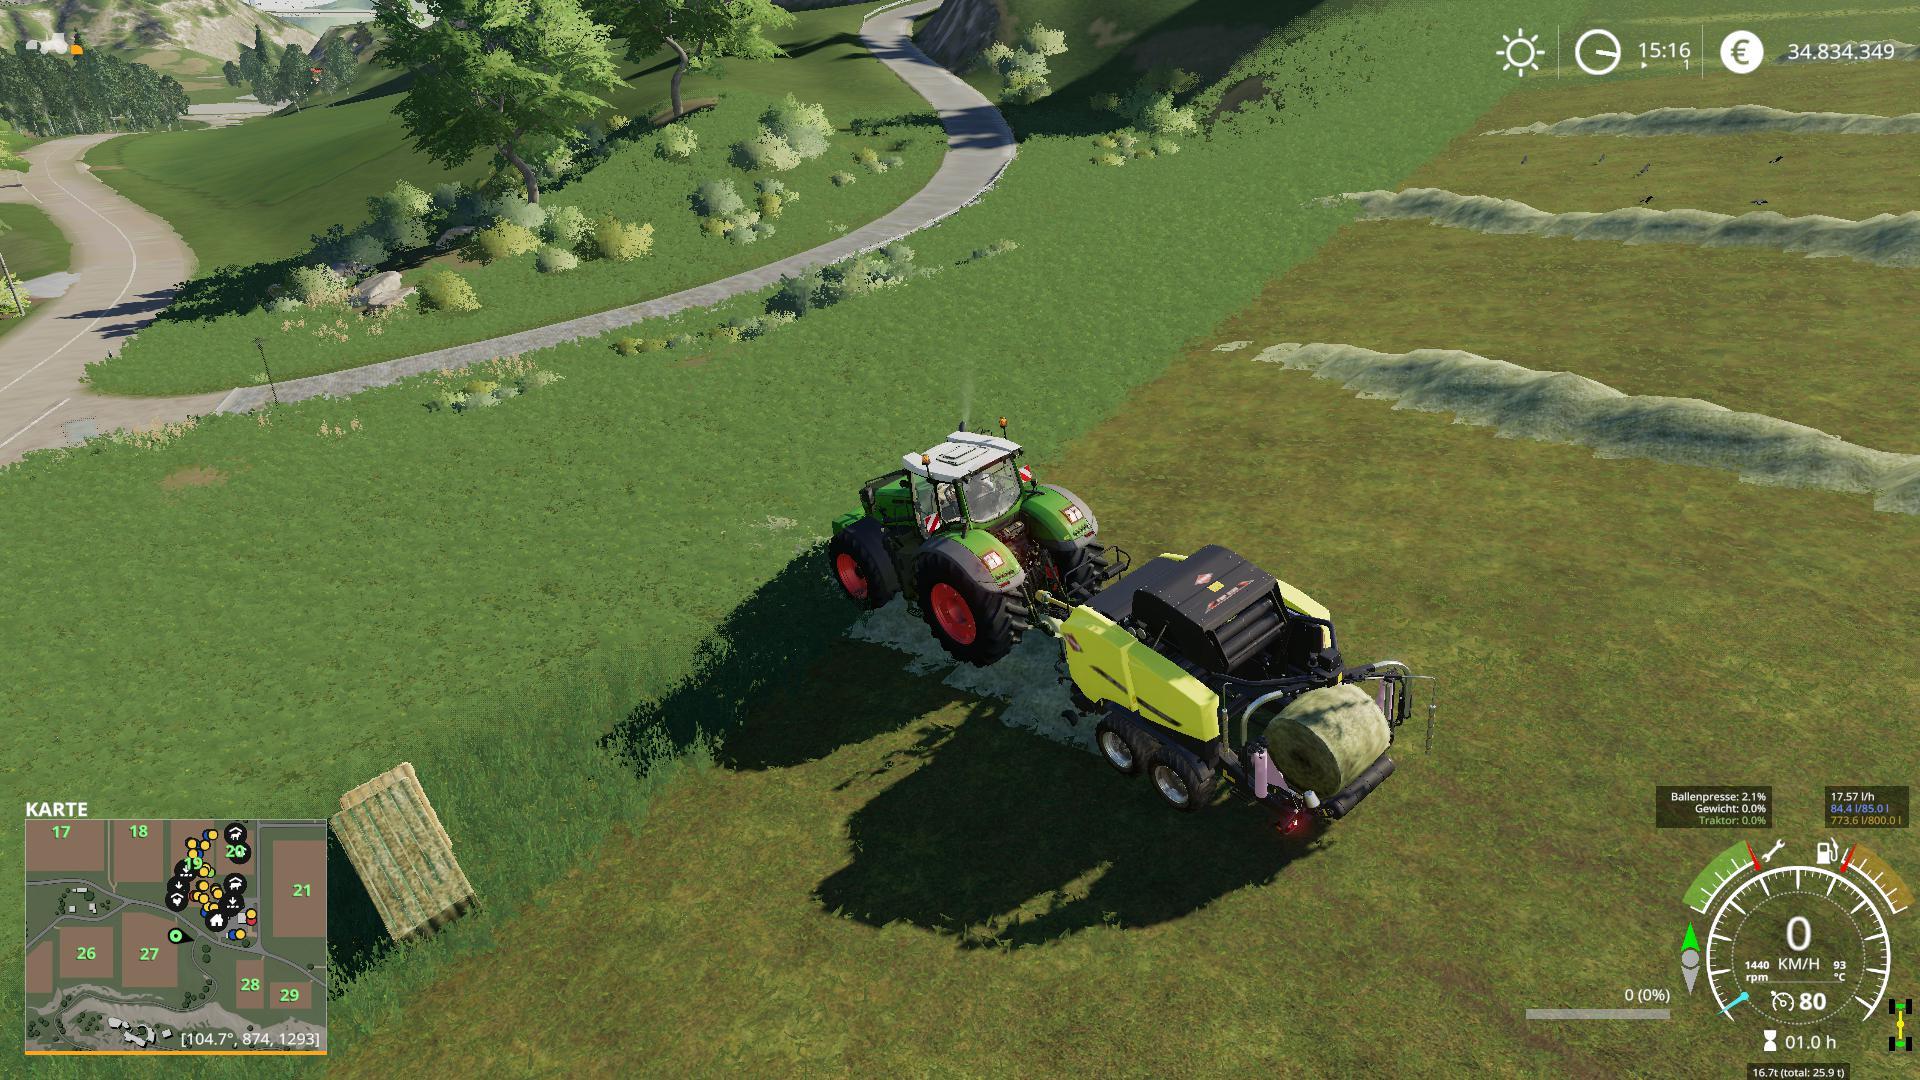 webboard เทศบาลตำบลไม้ยา :: Topic: farming simulator 19 (1/1)